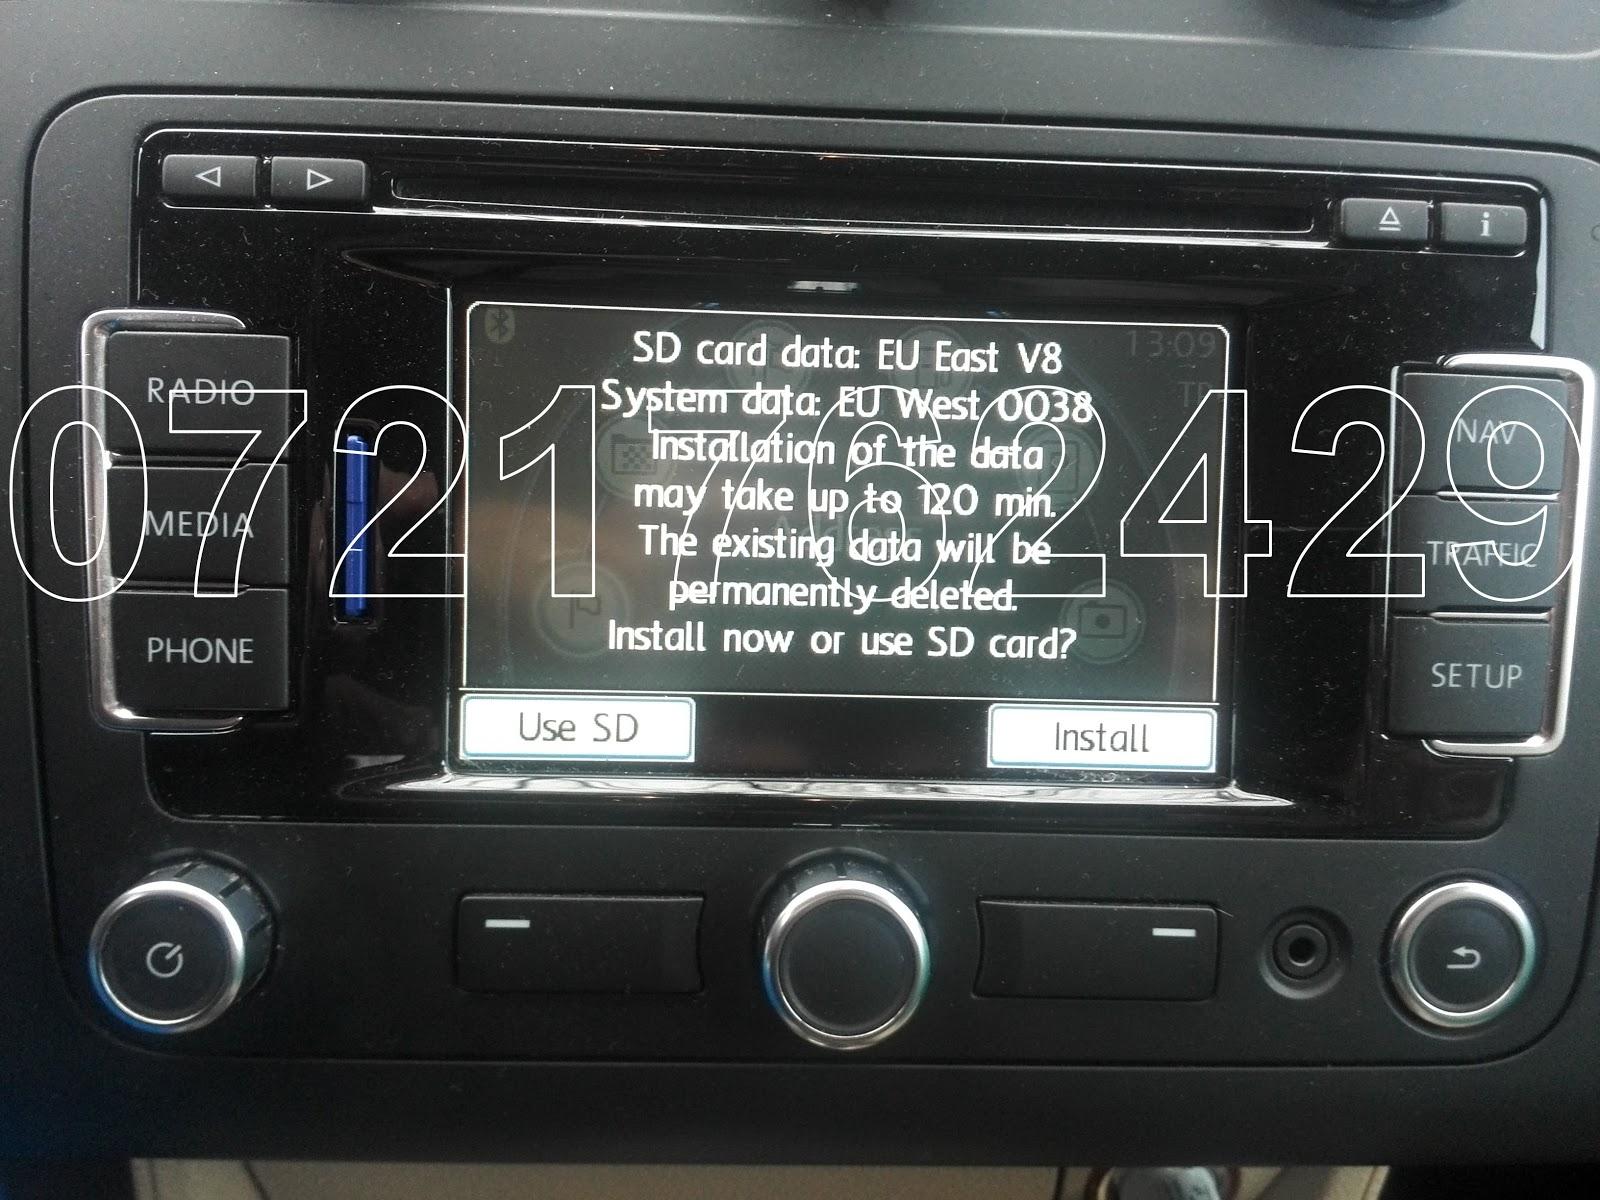 Betere HARTA CD DVD NAVIGATIE BMW MERCEDES AUDI OPEL HONDA NISSAN RENAULT CY-65